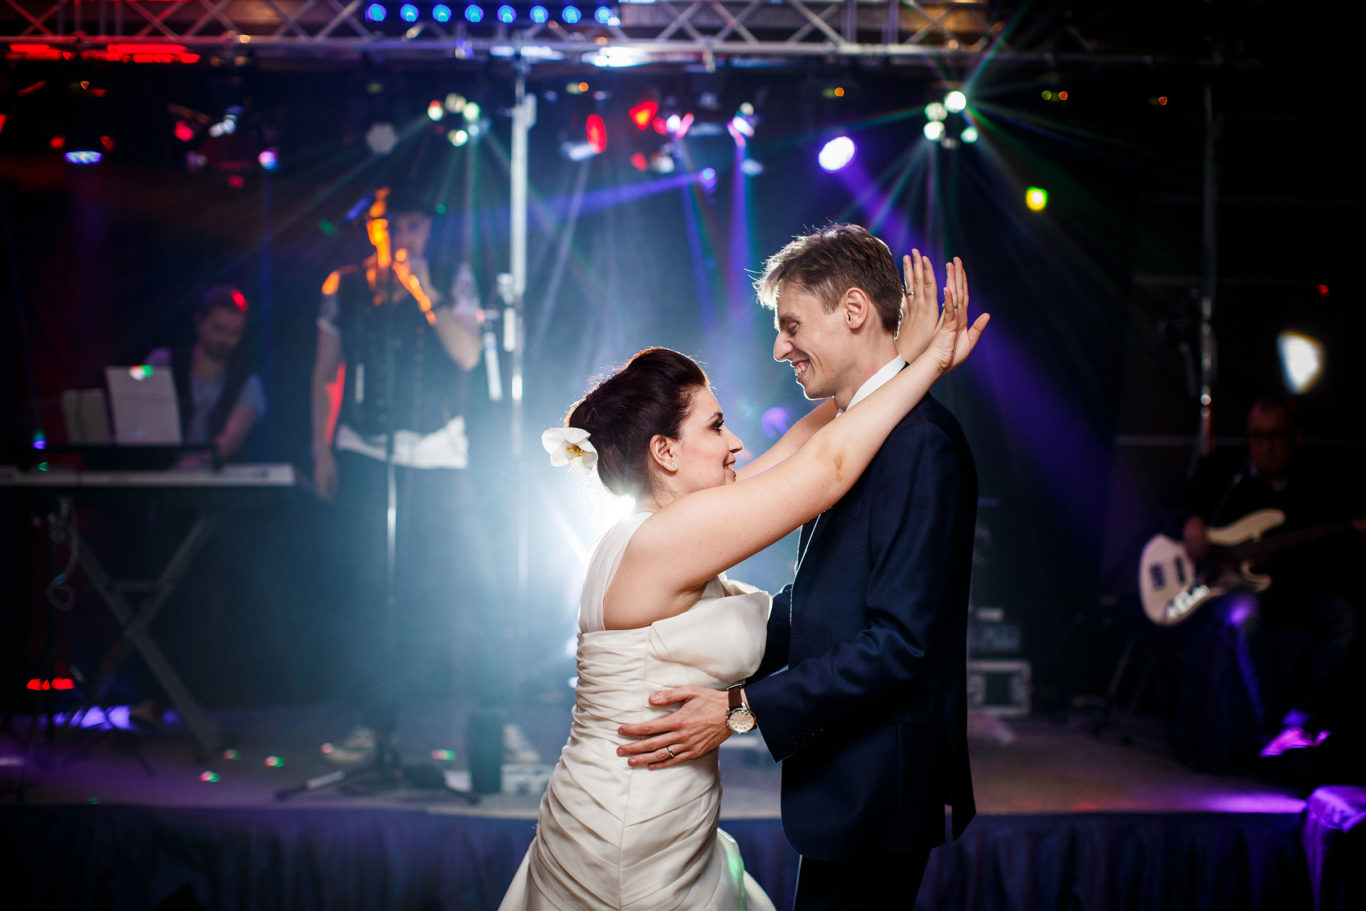 0464-Fotografie-nunta-Roxana-Costin-fotograf-Ciprian-Dumitrescu-DC1X1087